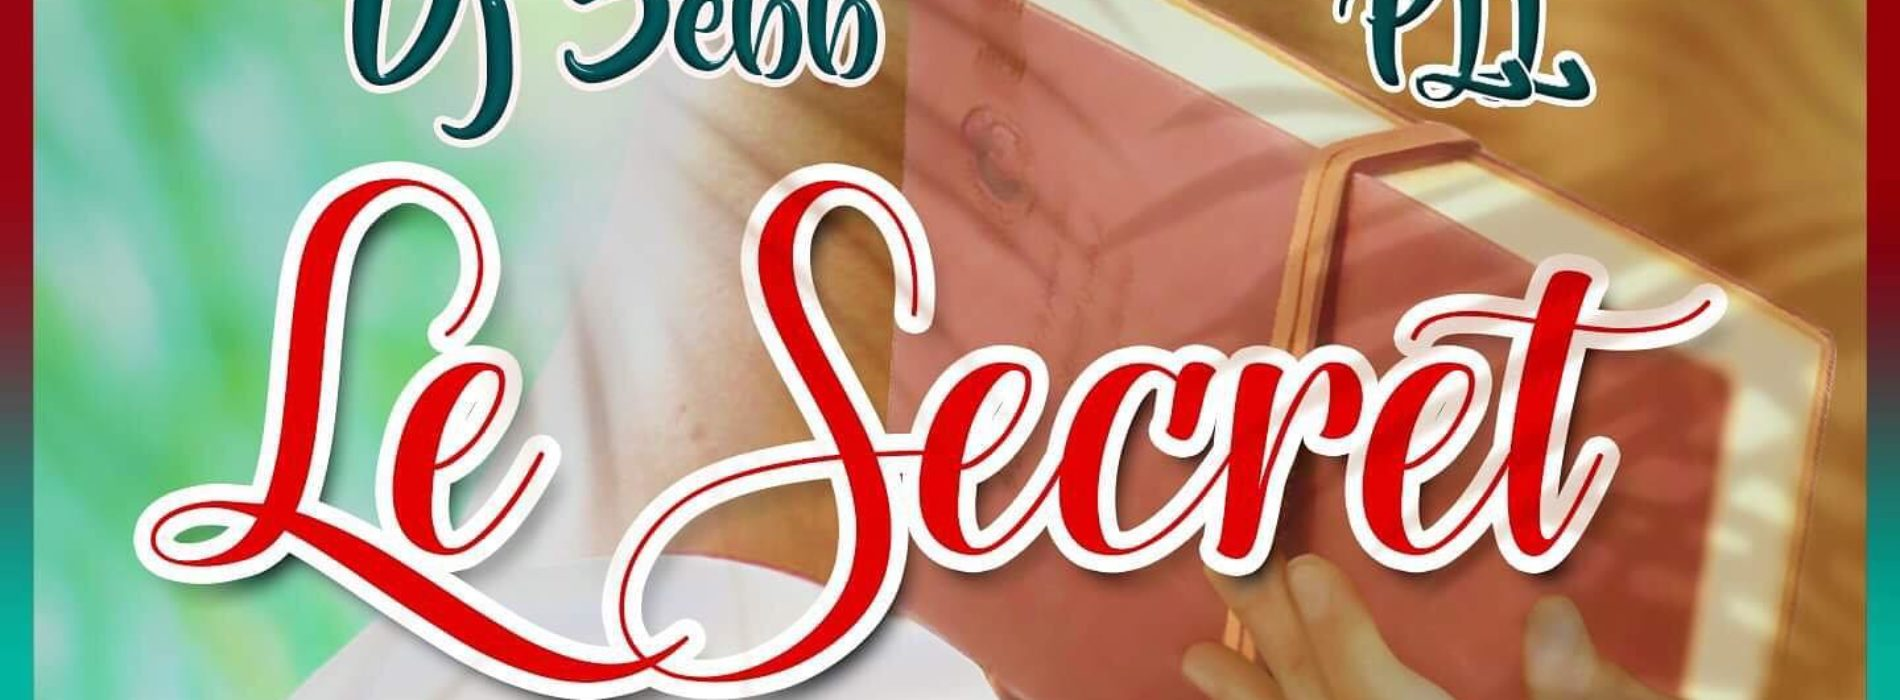 PLL feat Dj Sebb – Le Secret – Mai 2019